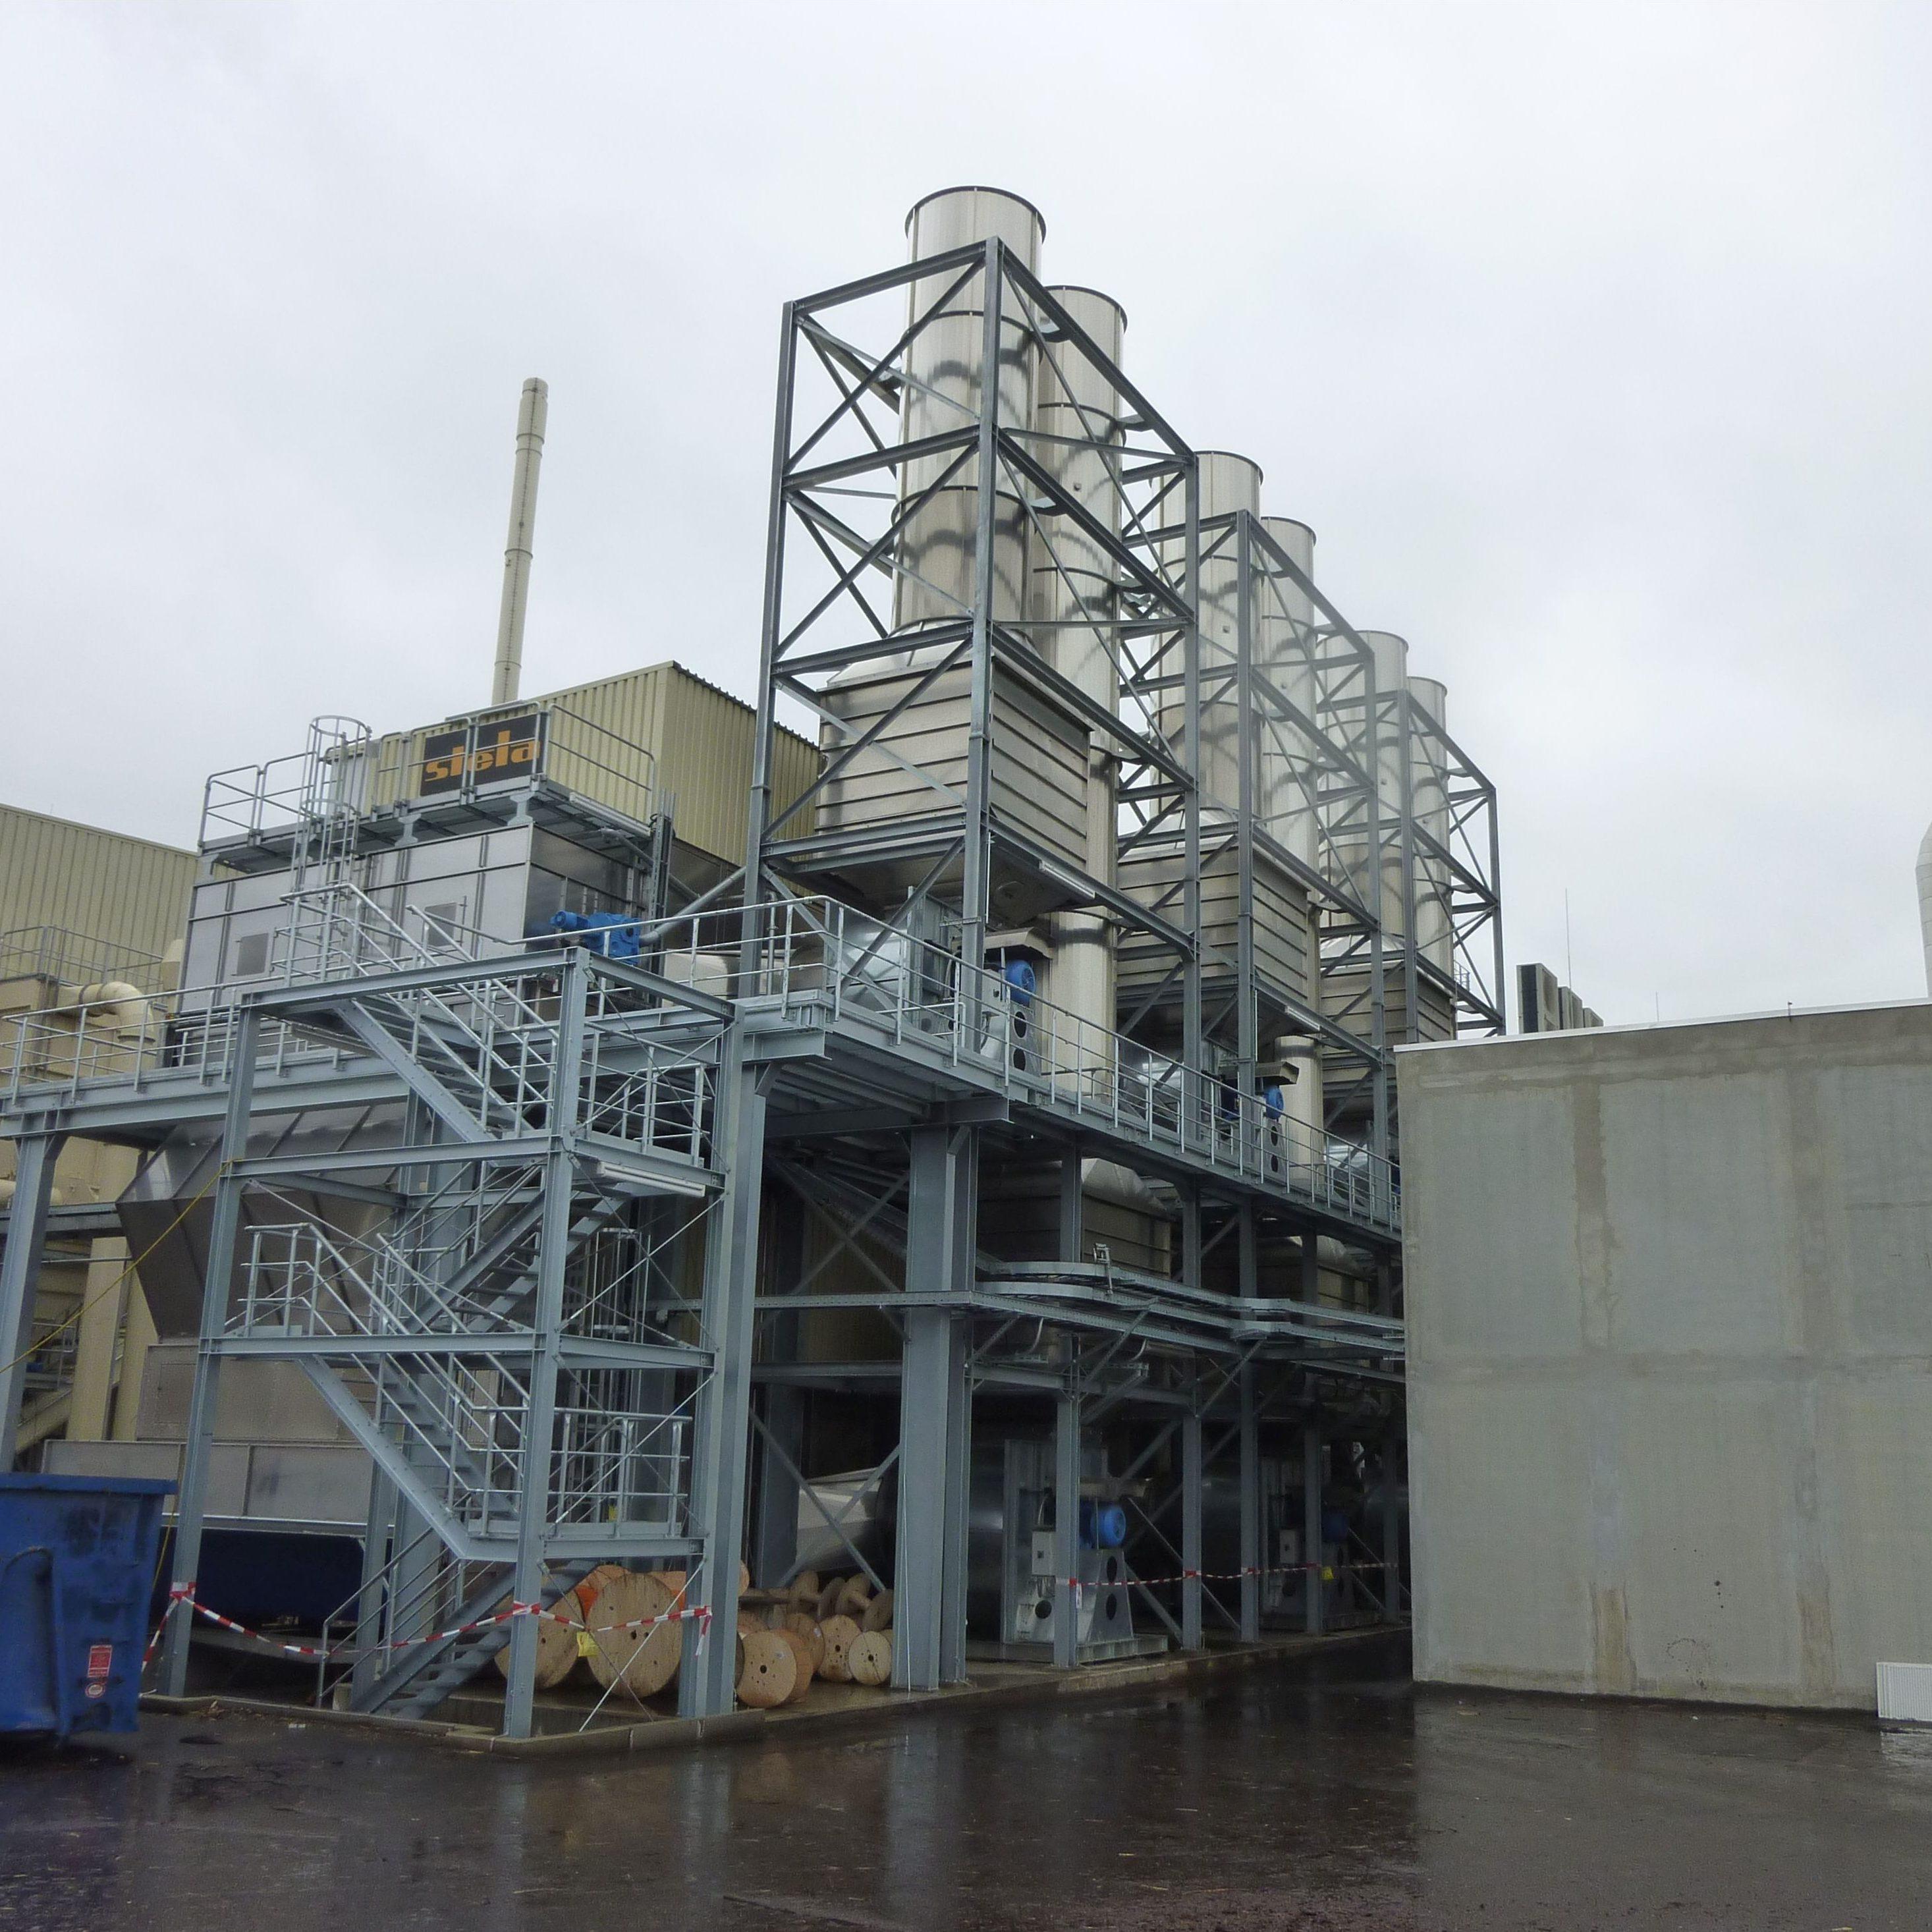 Swiss Krono Energieberatung Heiligengraben - Energieberatung Industrie